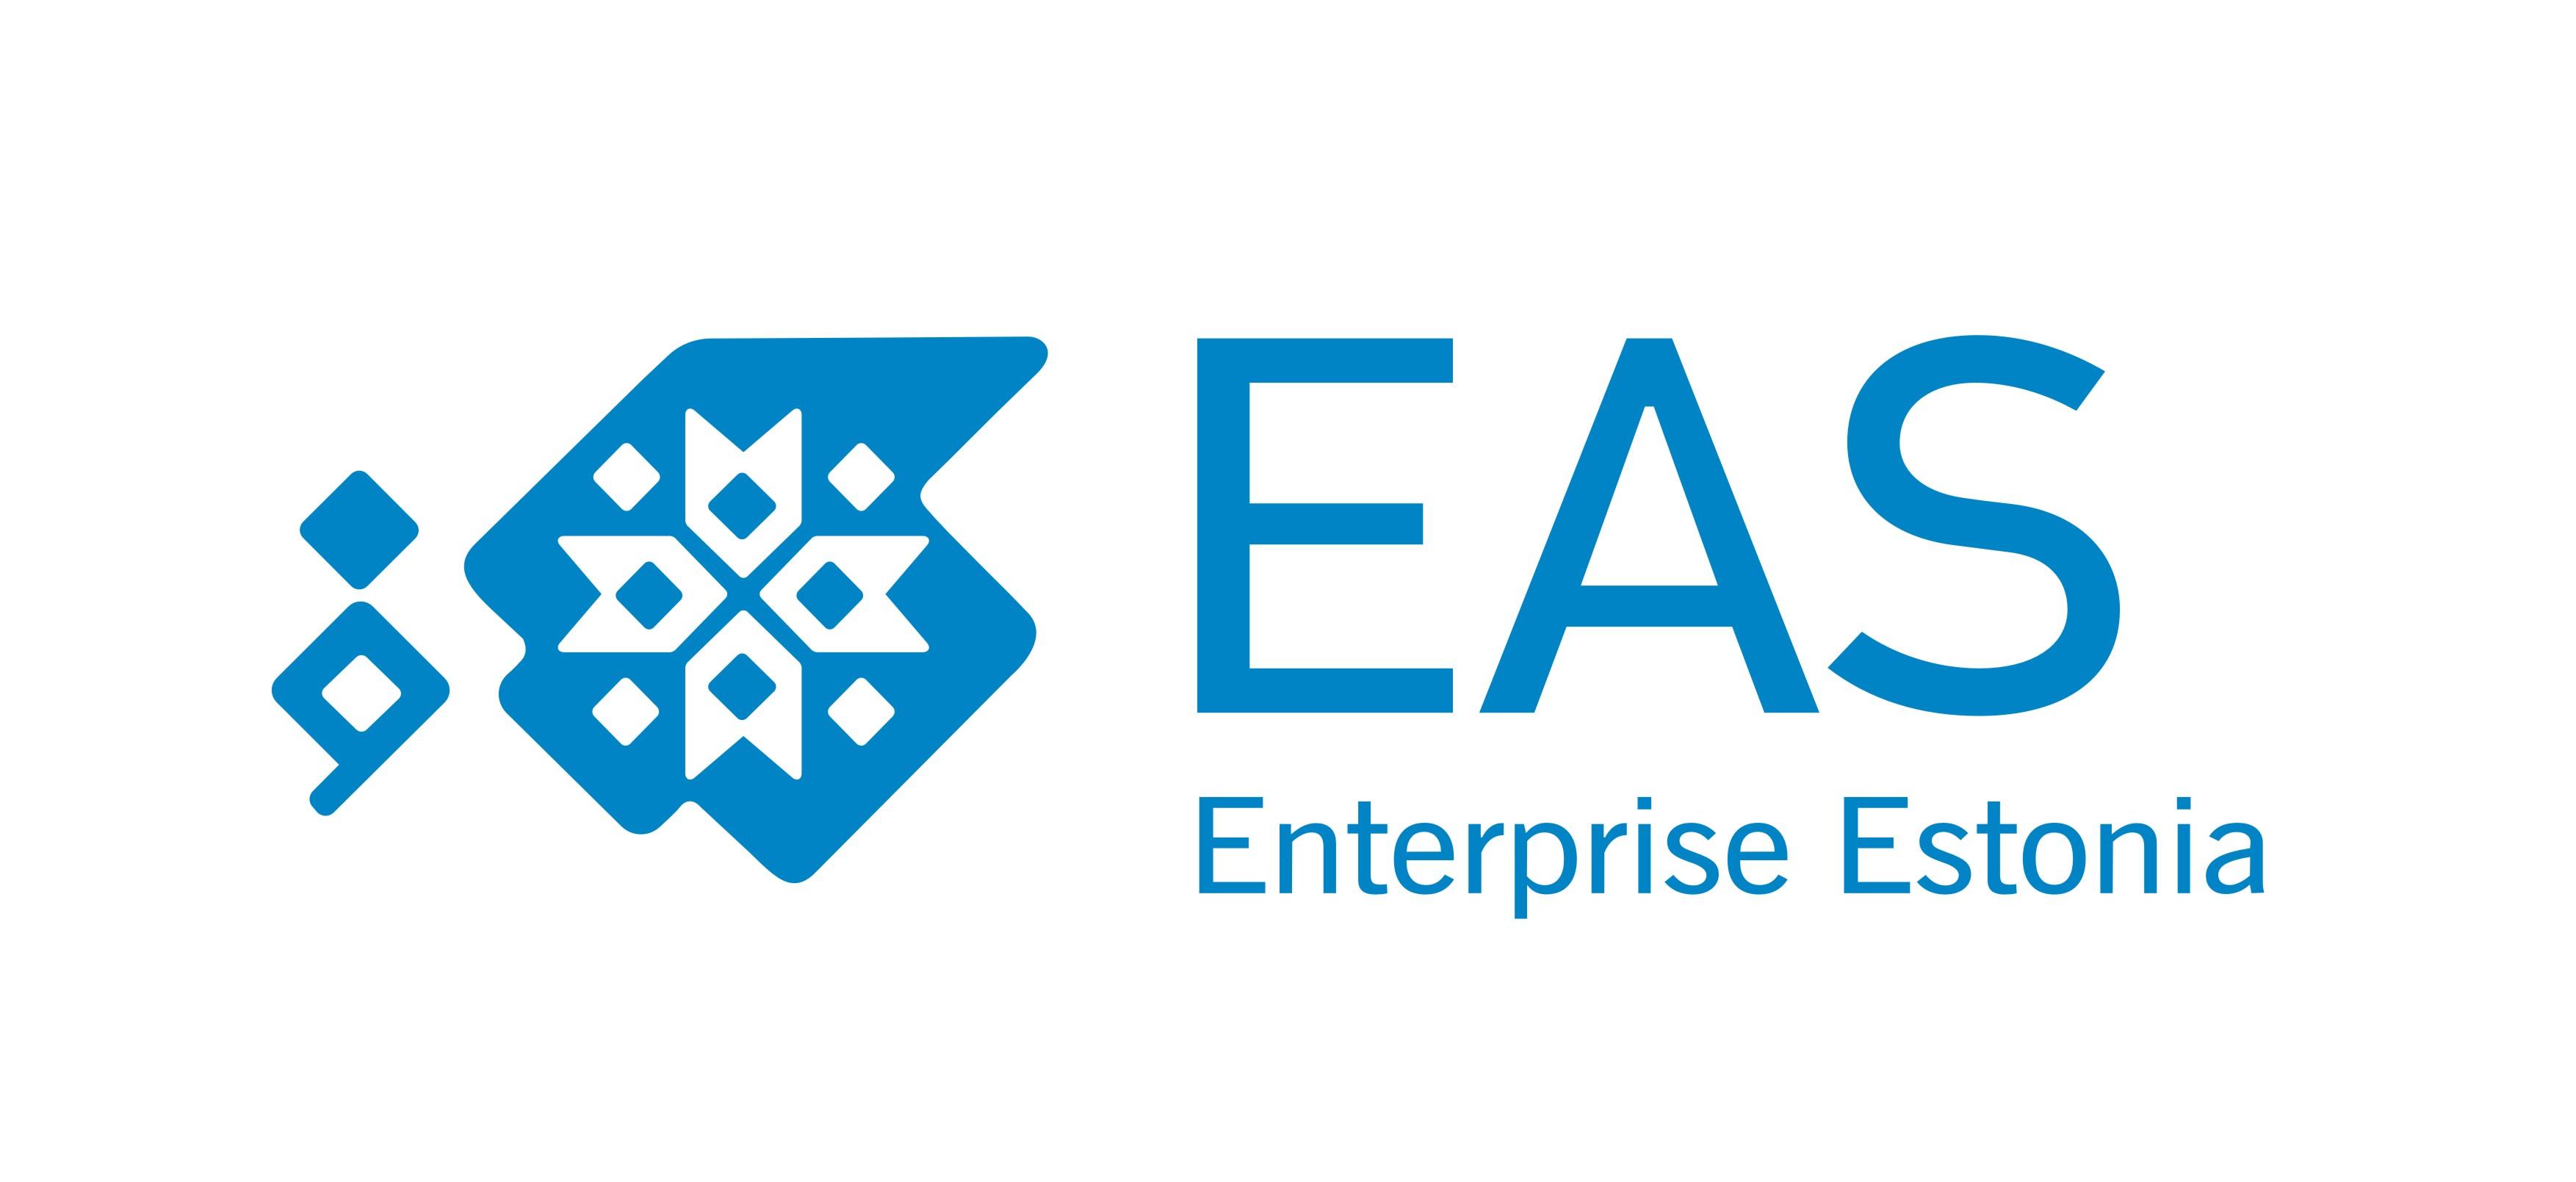 Icon for Enterprise Estonia